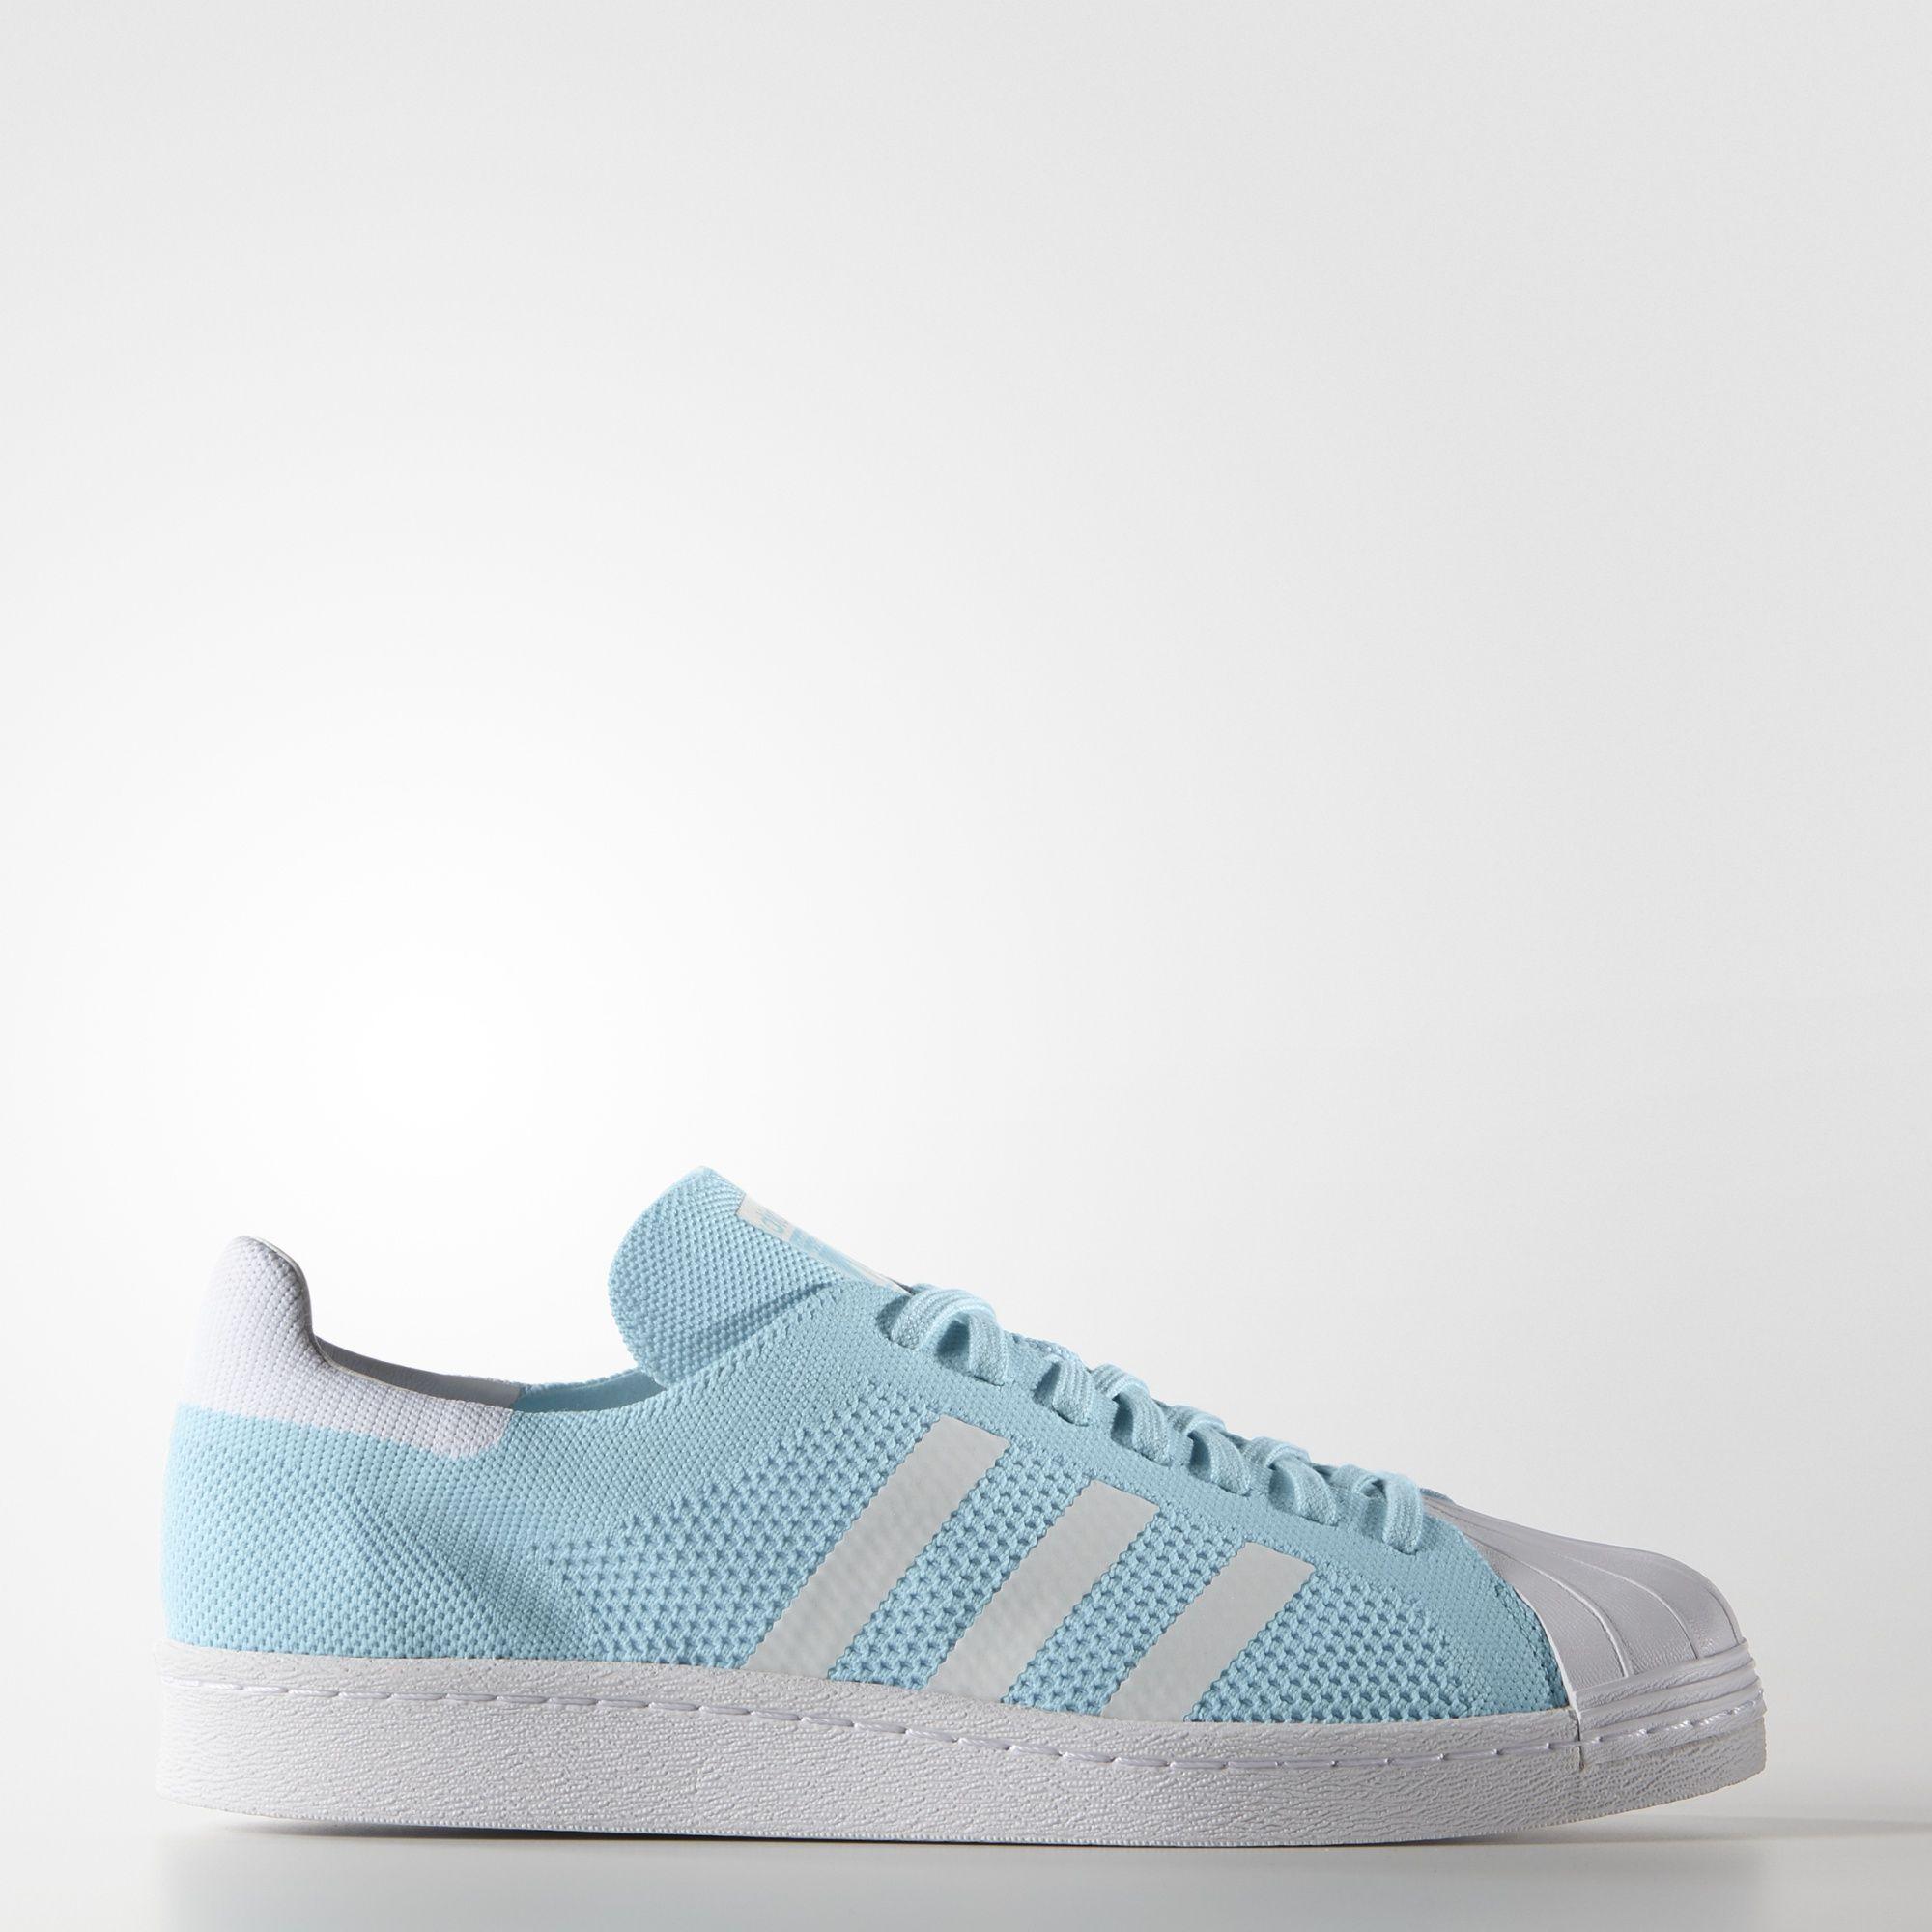 online retailer 03ddb 719e4 adidas - Superstar 80s Primeknit Schuh